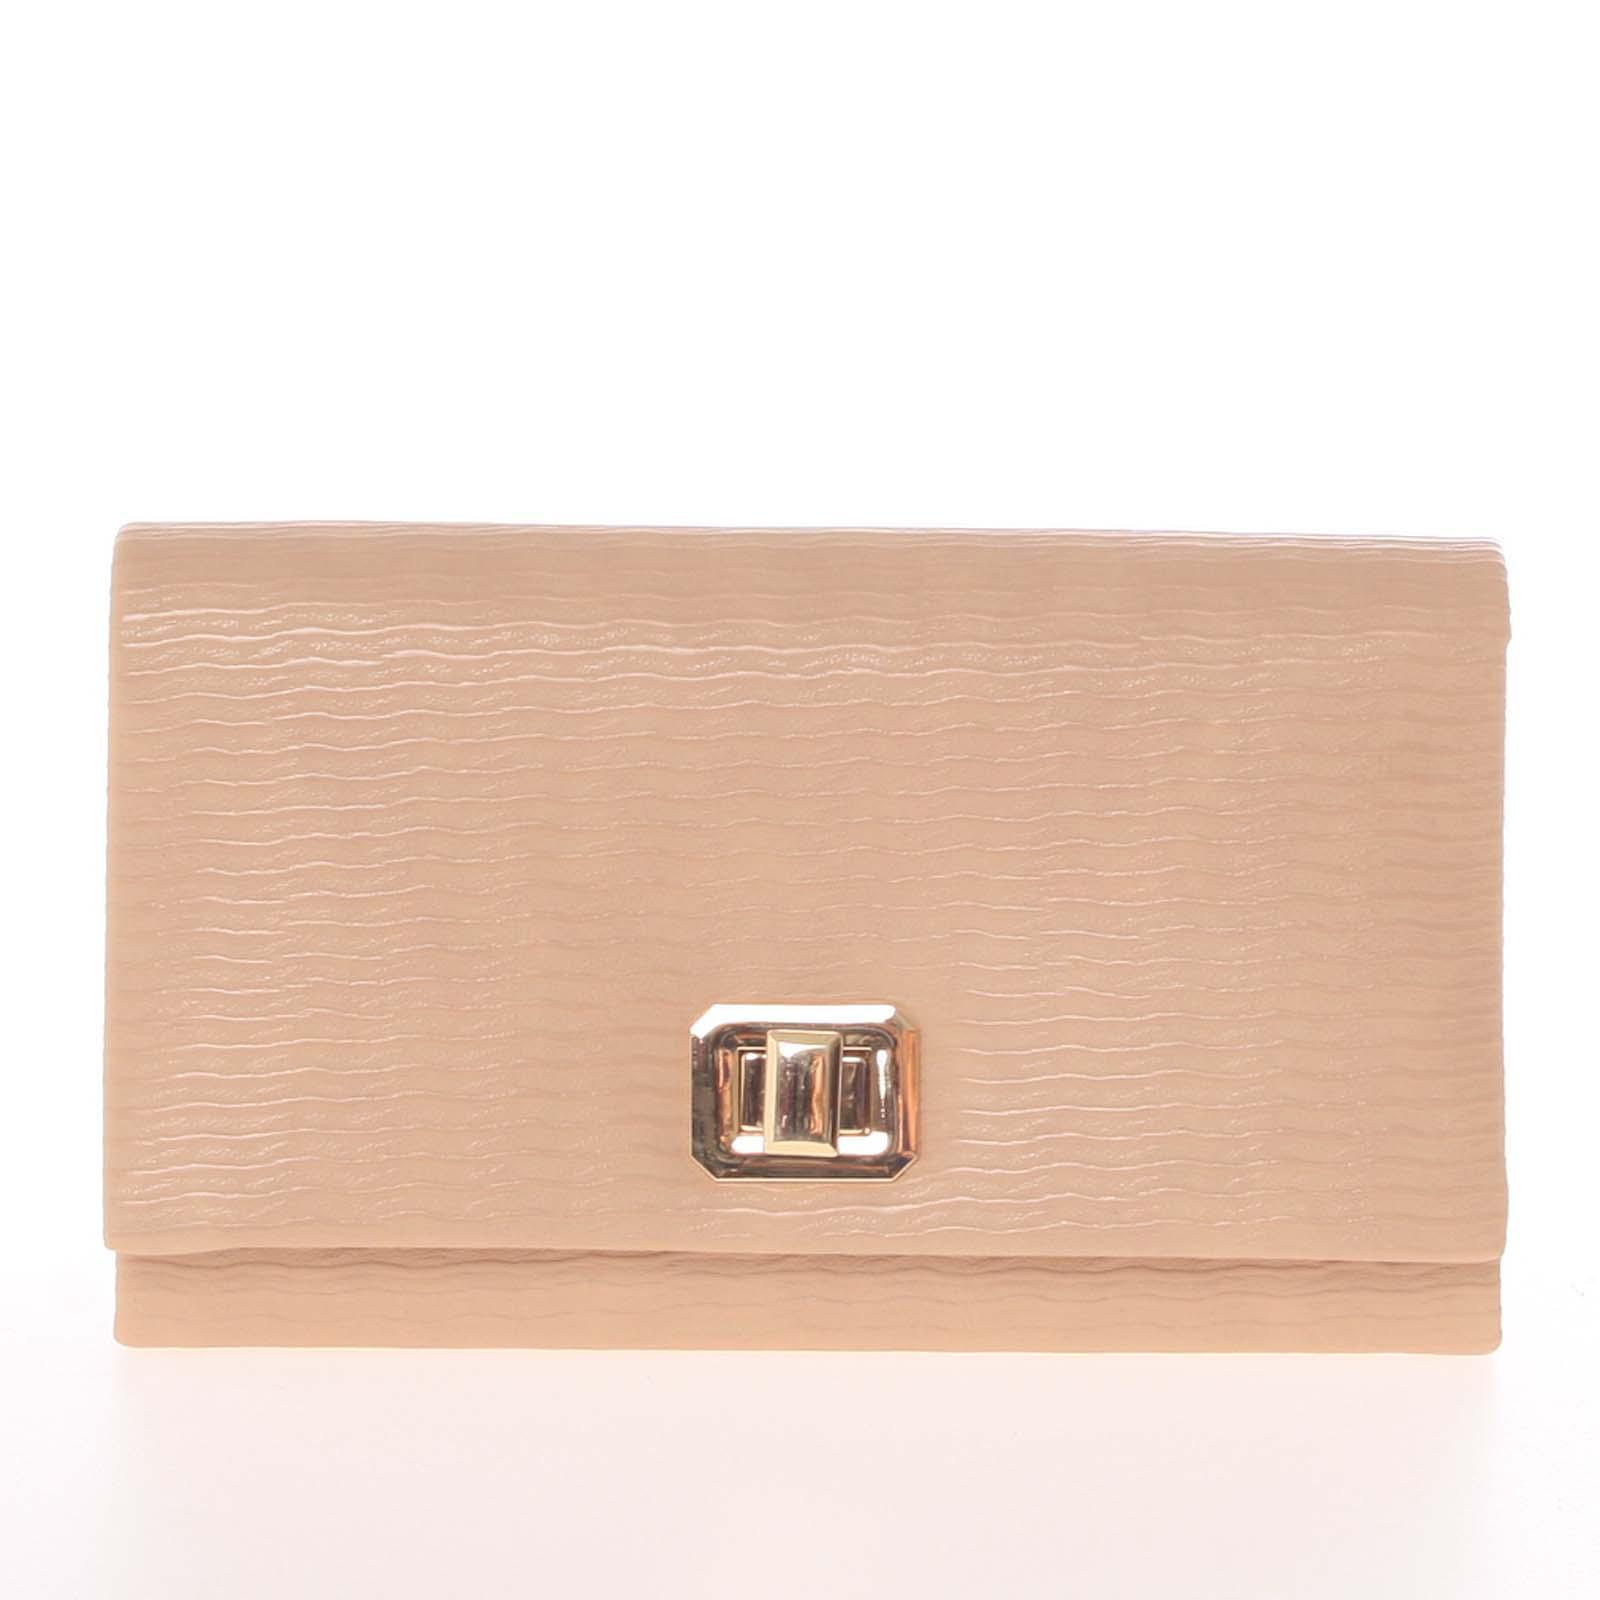 Módna dámska vzorovaná listová kabelka marhuľová - Delami D694